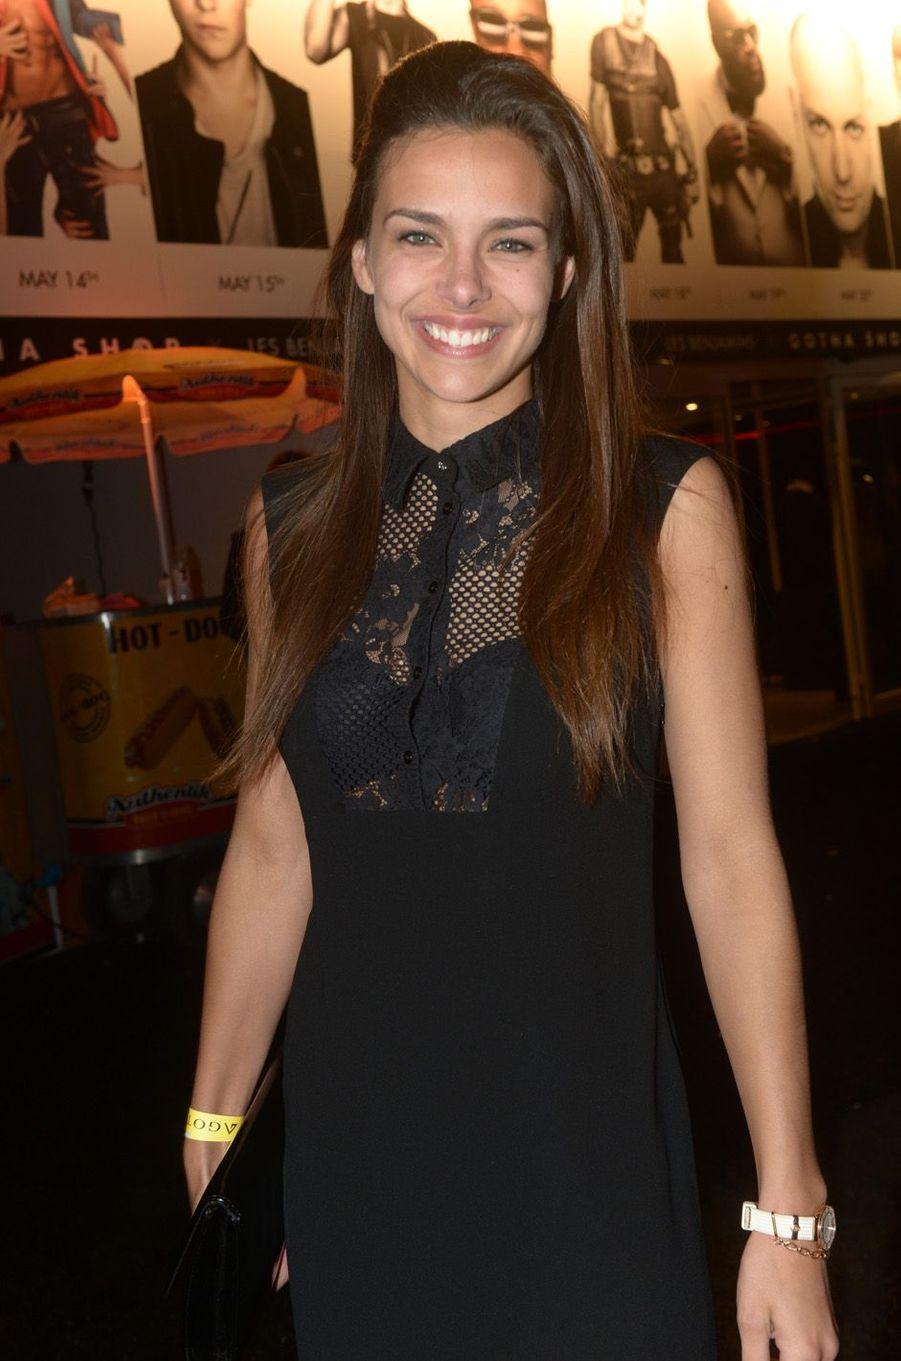 Marine Lorphelin, le 14 mai 2015 à Paris